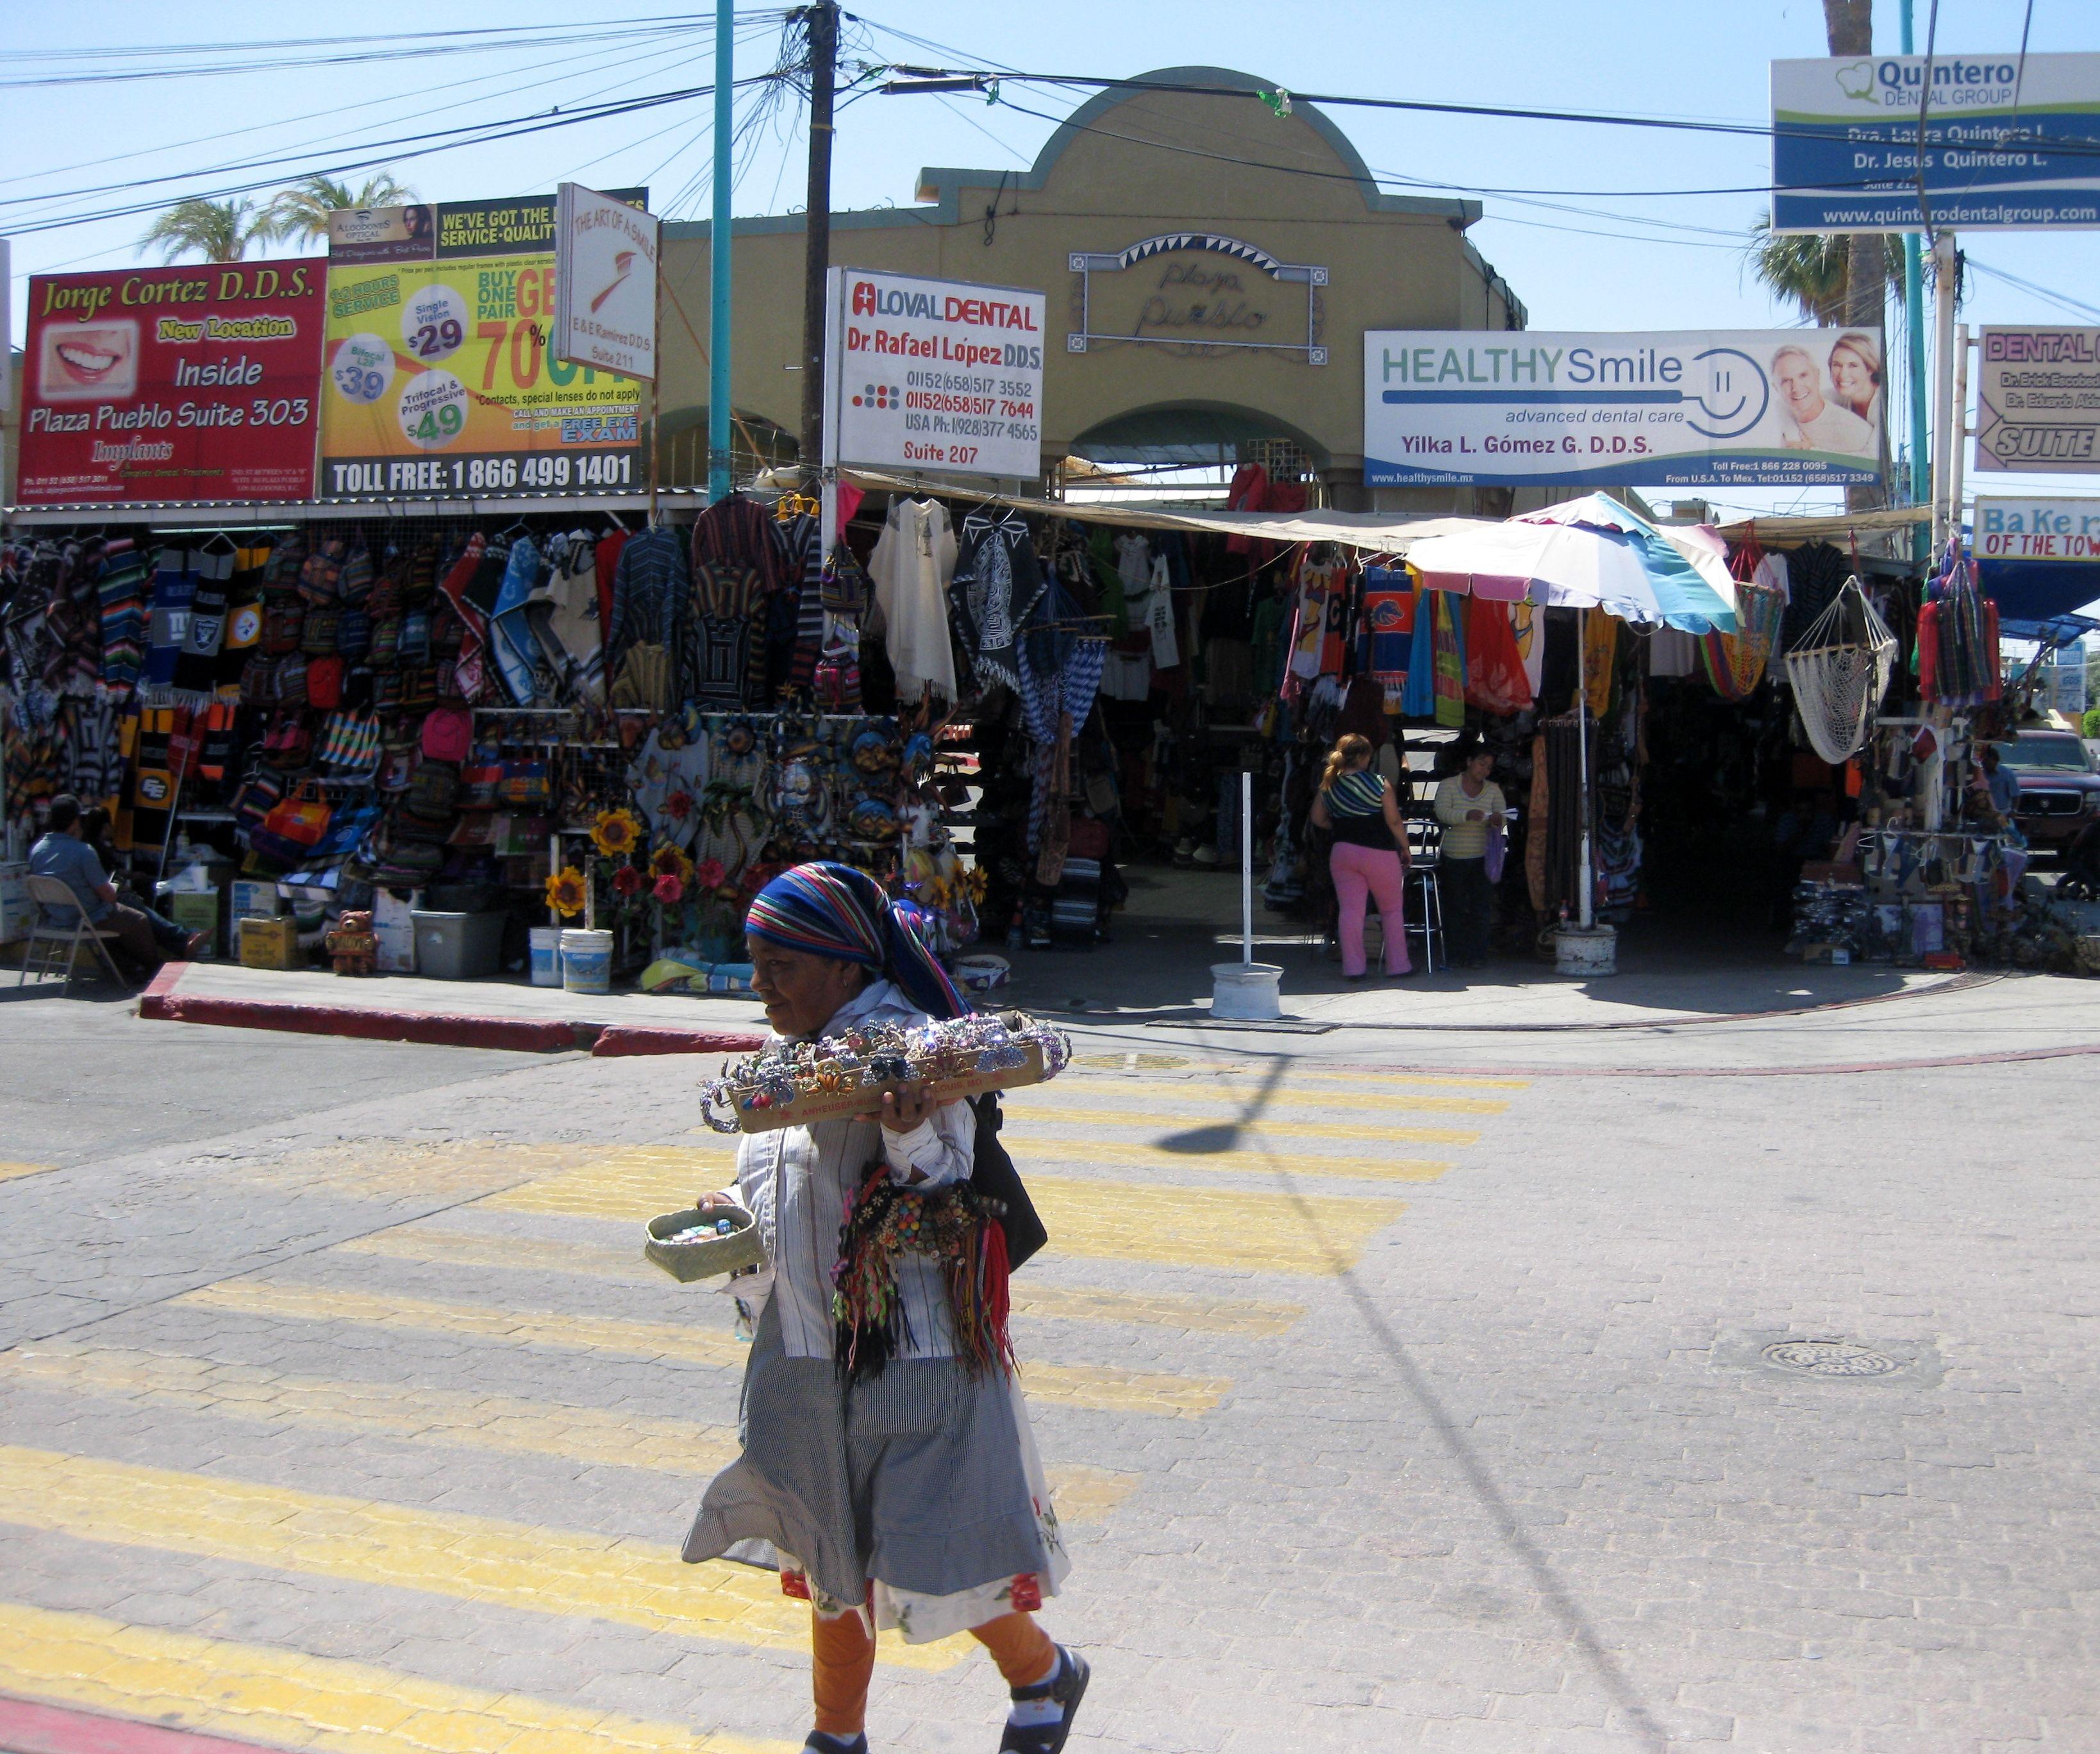 Downtown Los Algodones Baja Mexico Shopped Till We Dropped